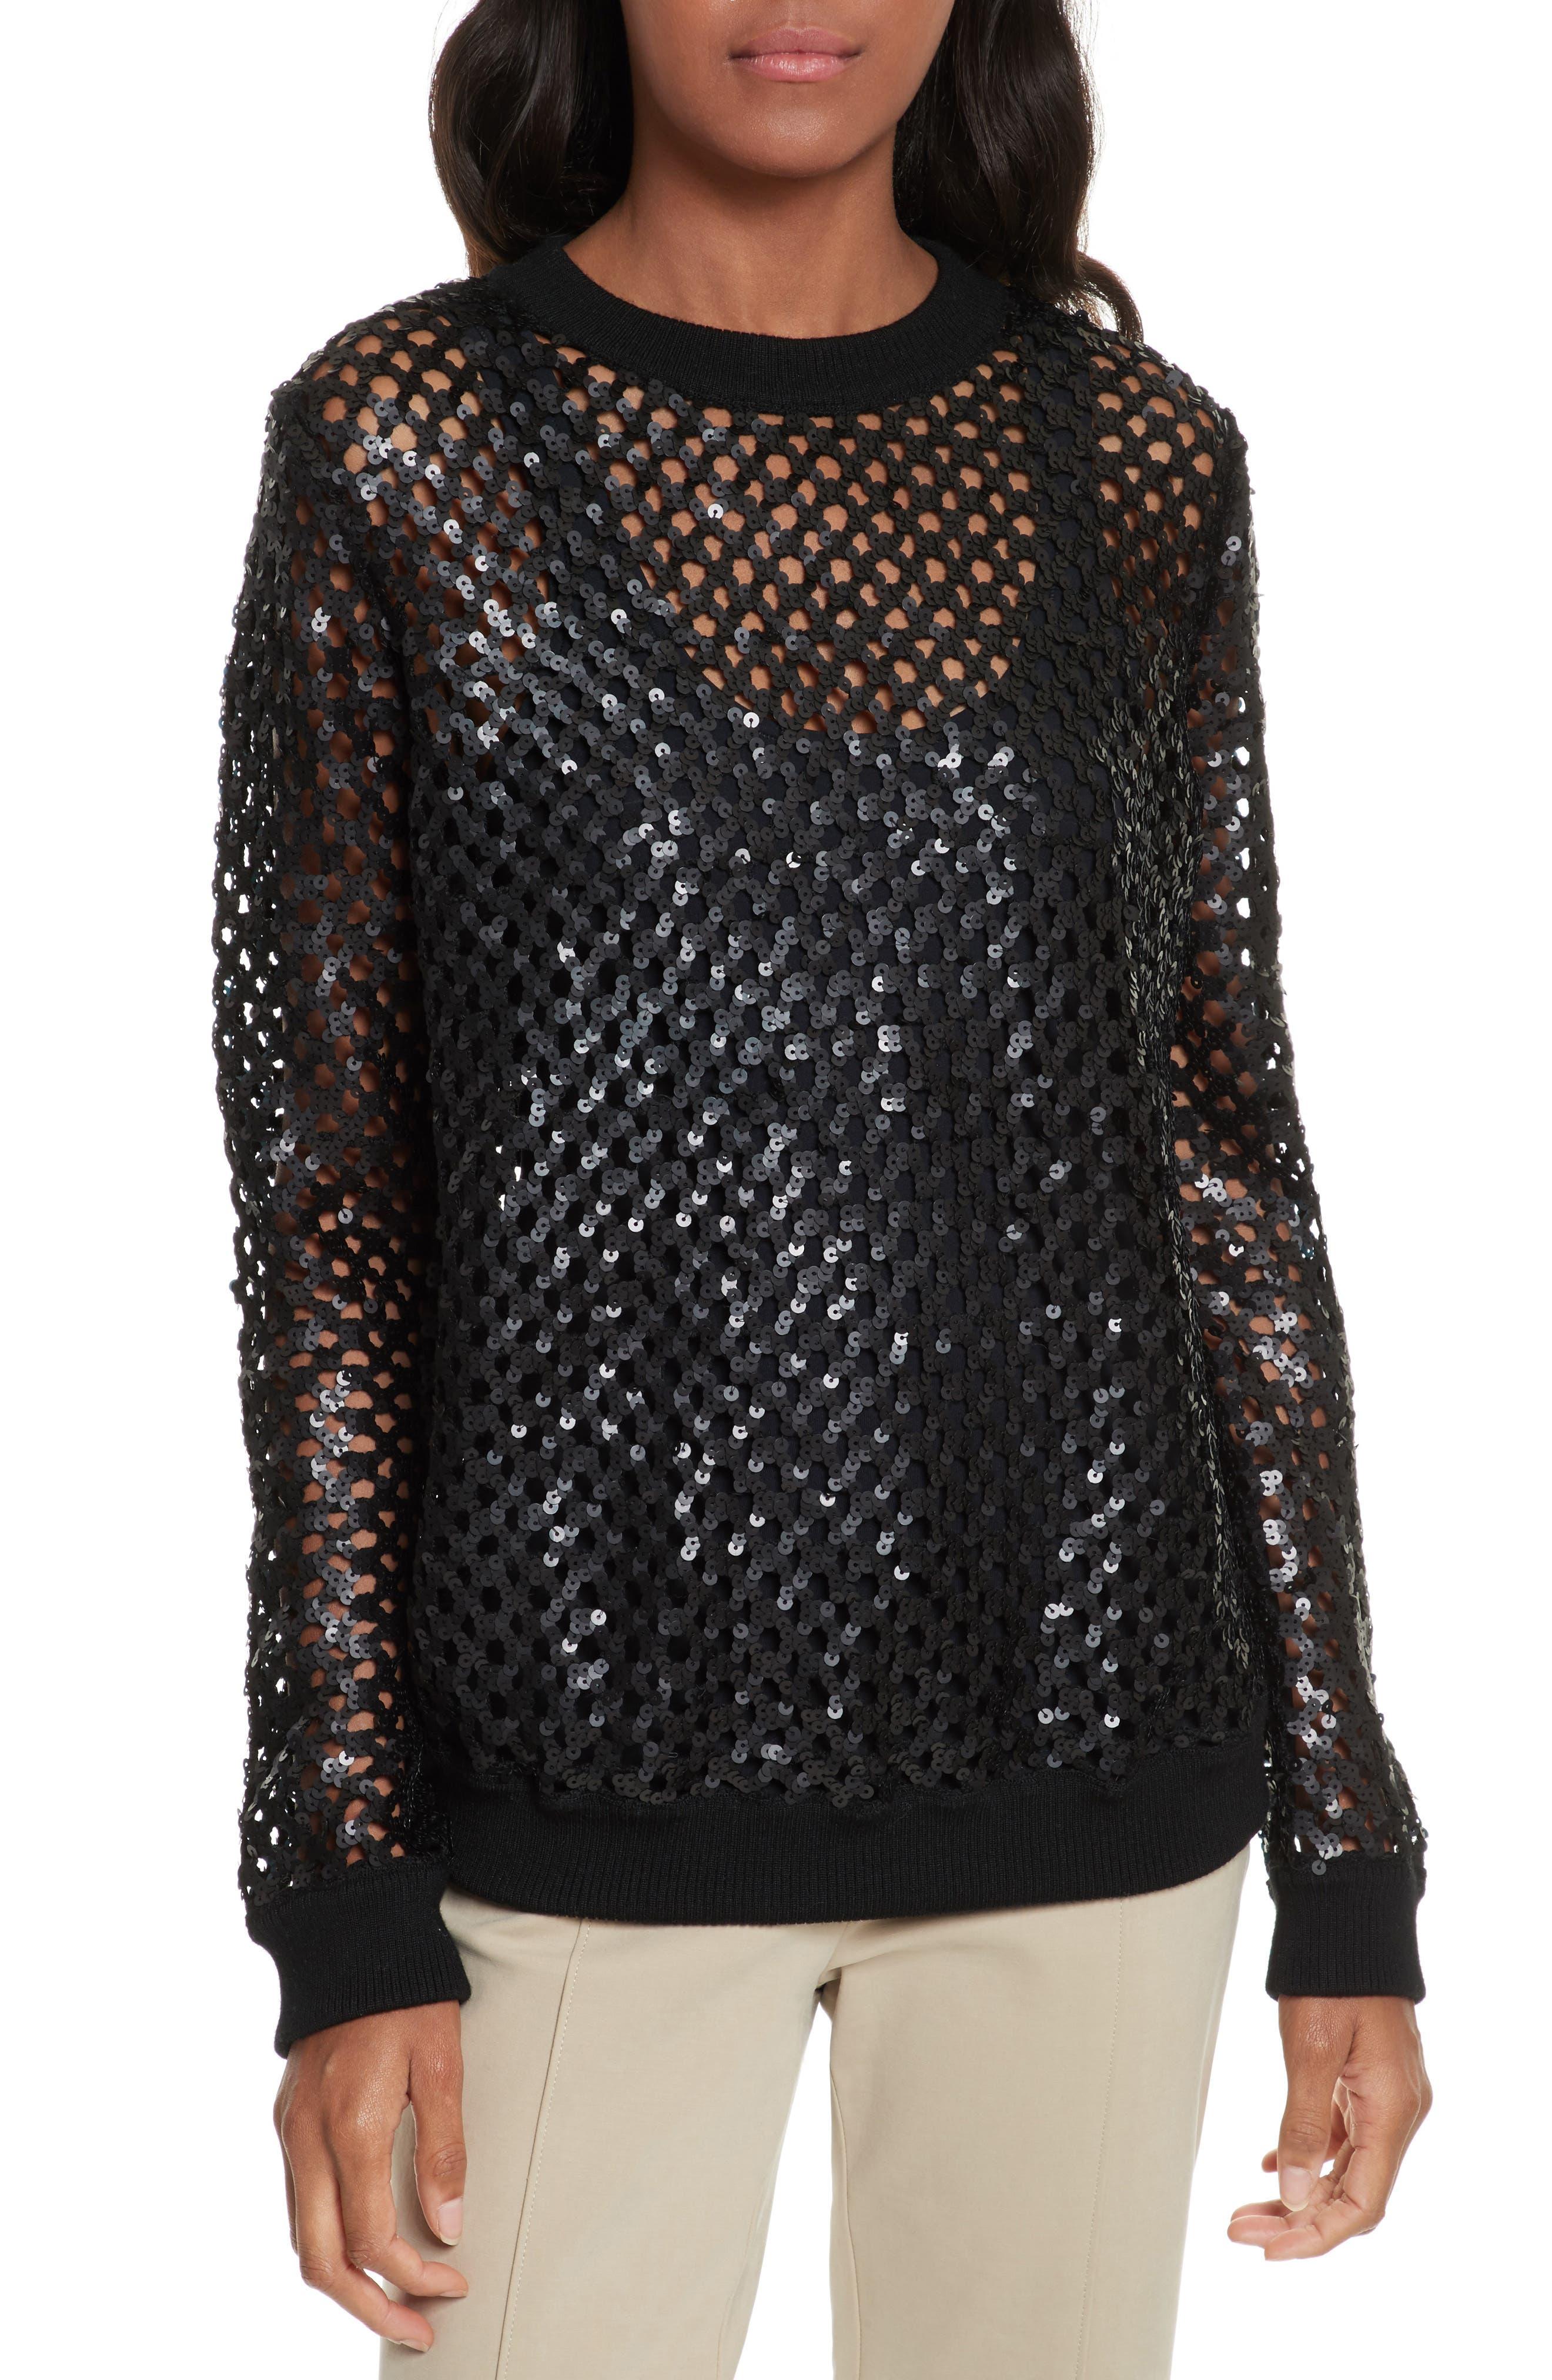 Alternate Image 1 Selected - Tory Burch Lansing Sequin Mesh Sweater